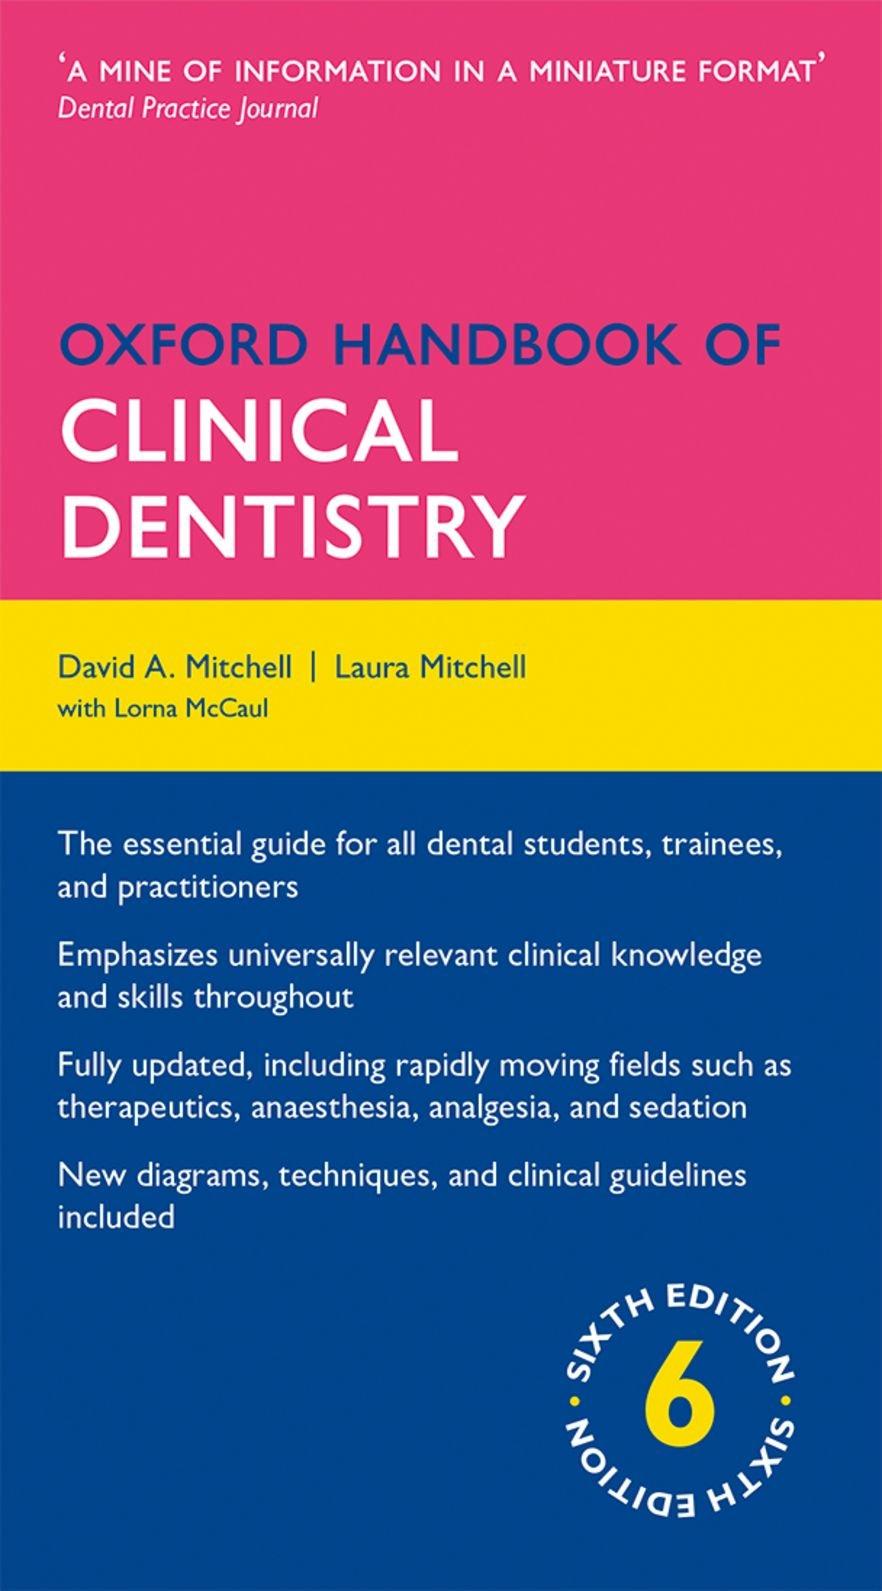 Oxford Handbook of Clinical Dentistry 6/e Flexicover Oxford Medical  Handbooks: Amazon.co.uk: David A. Mitchell, Laura Mitchell: Books